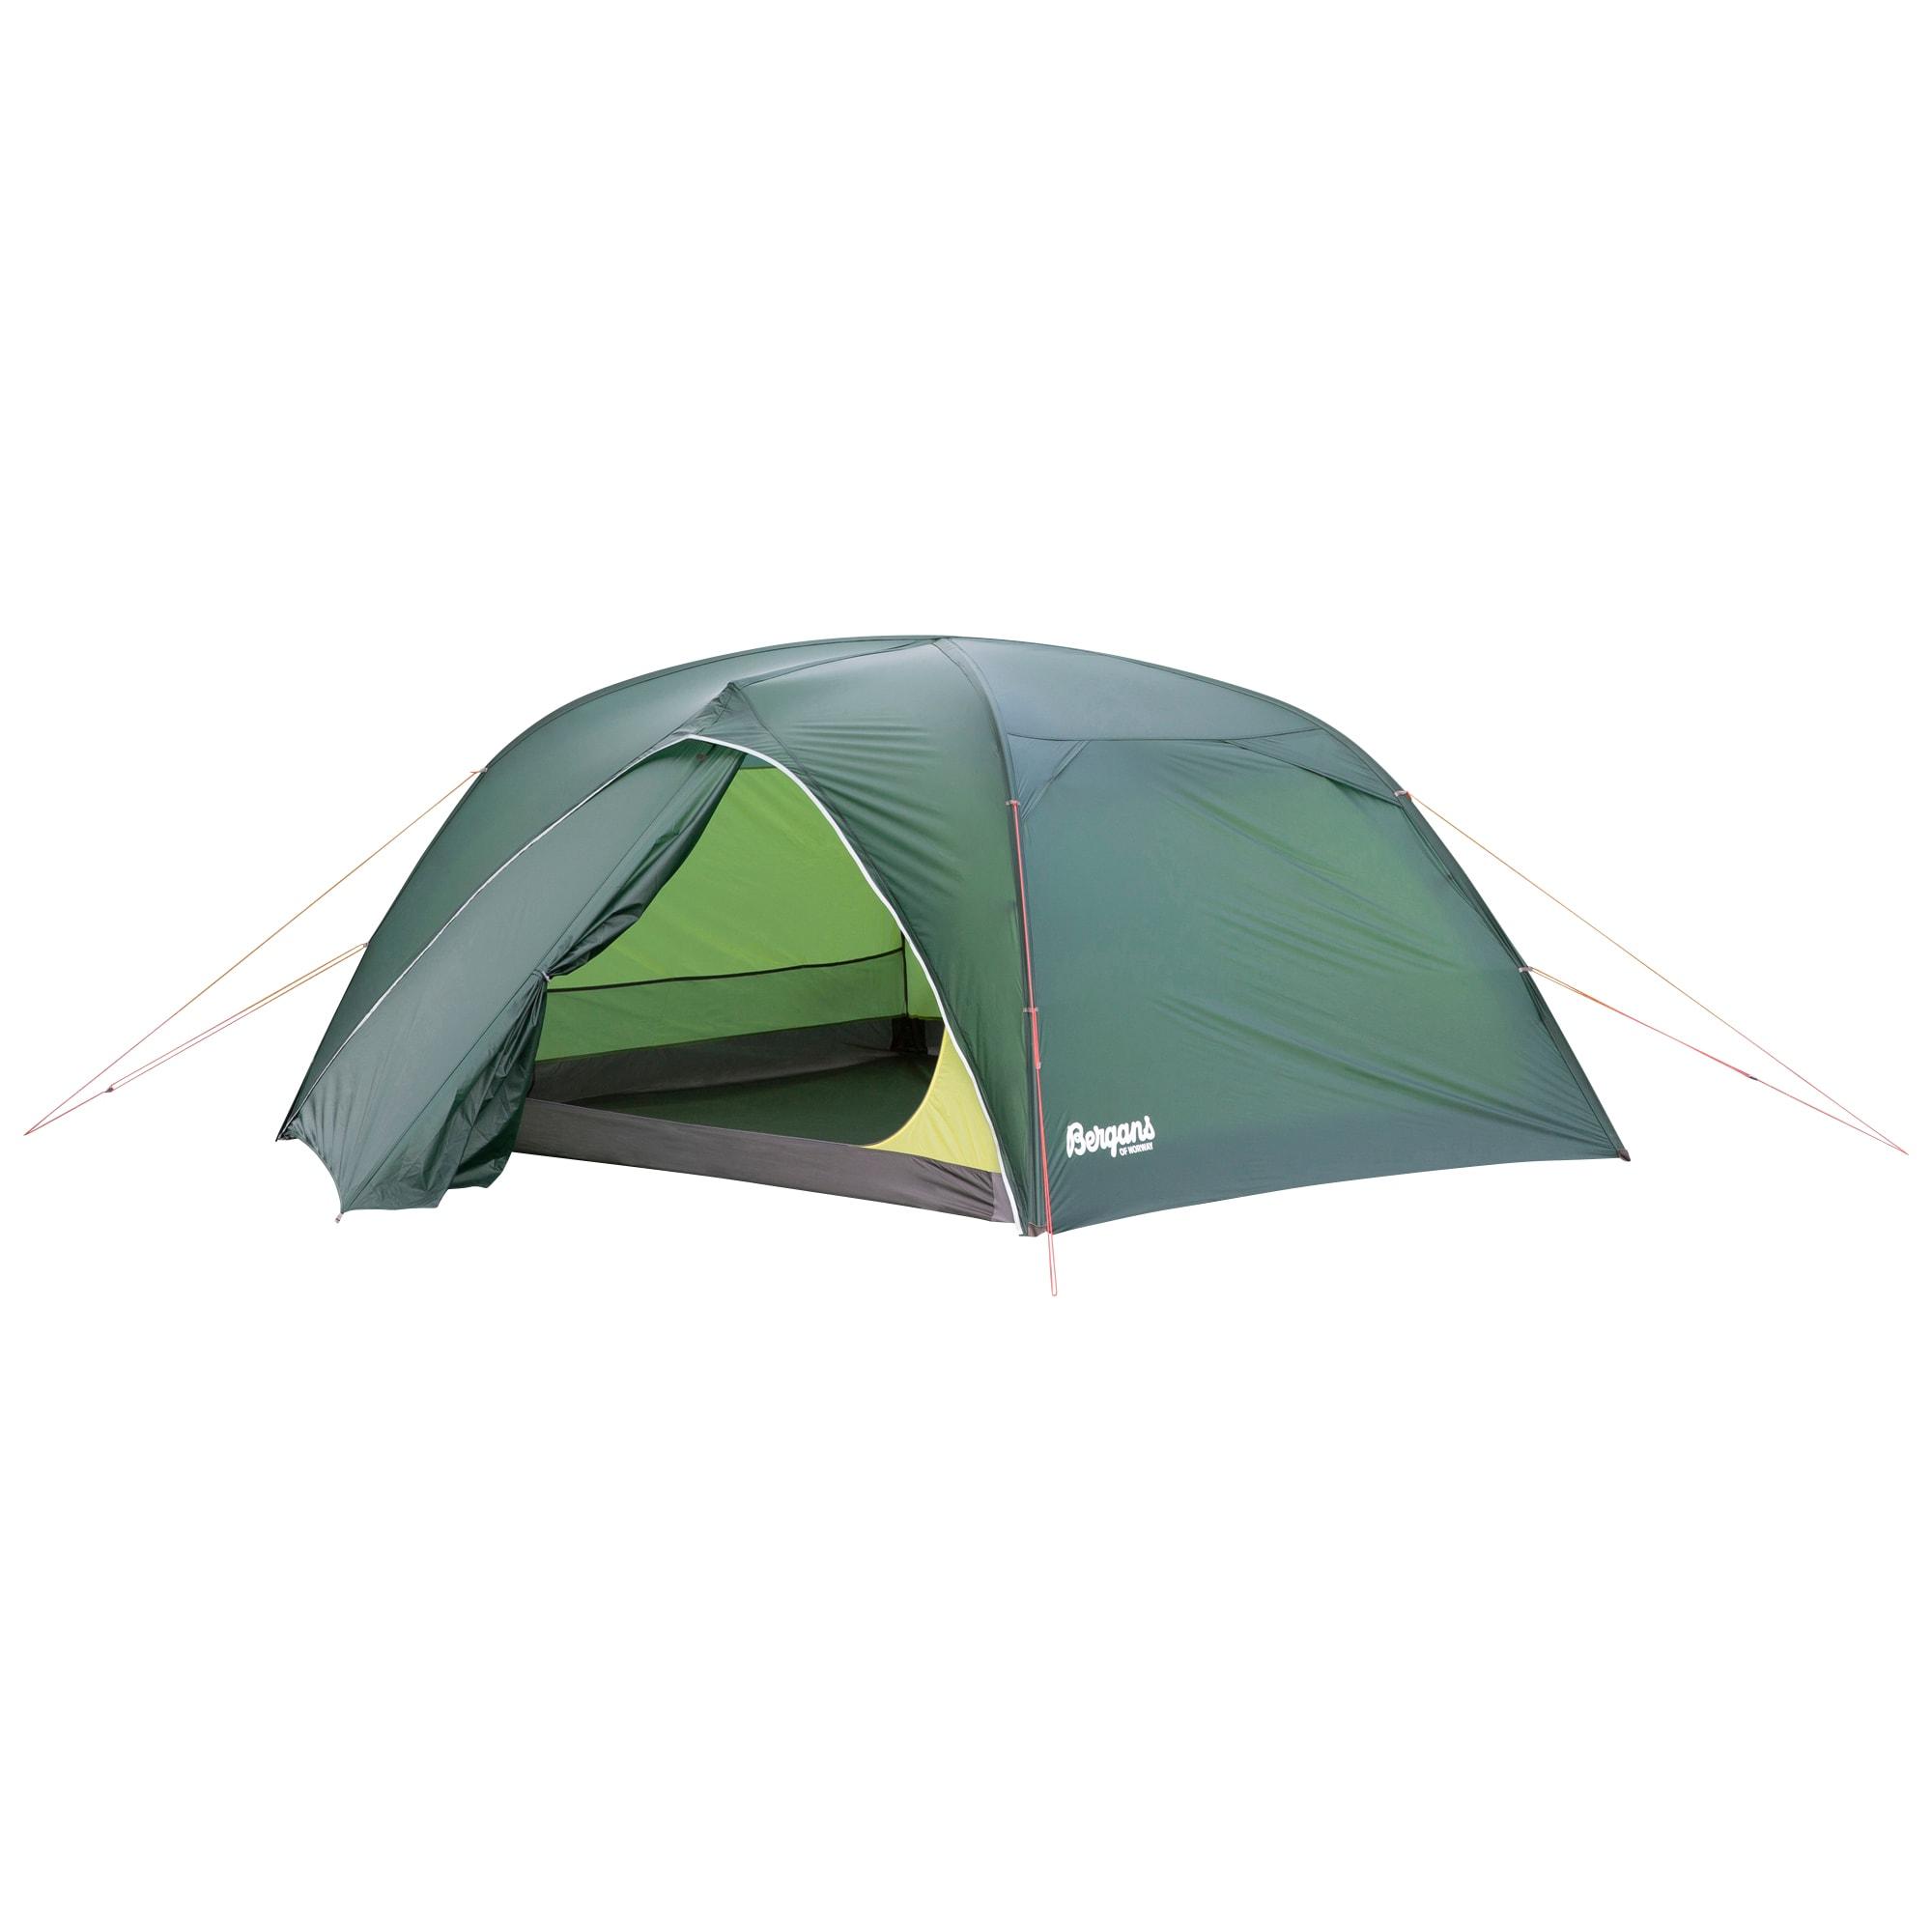 Kjøp Bergans Super Light Dome 3 pers Tent fra Outnorth